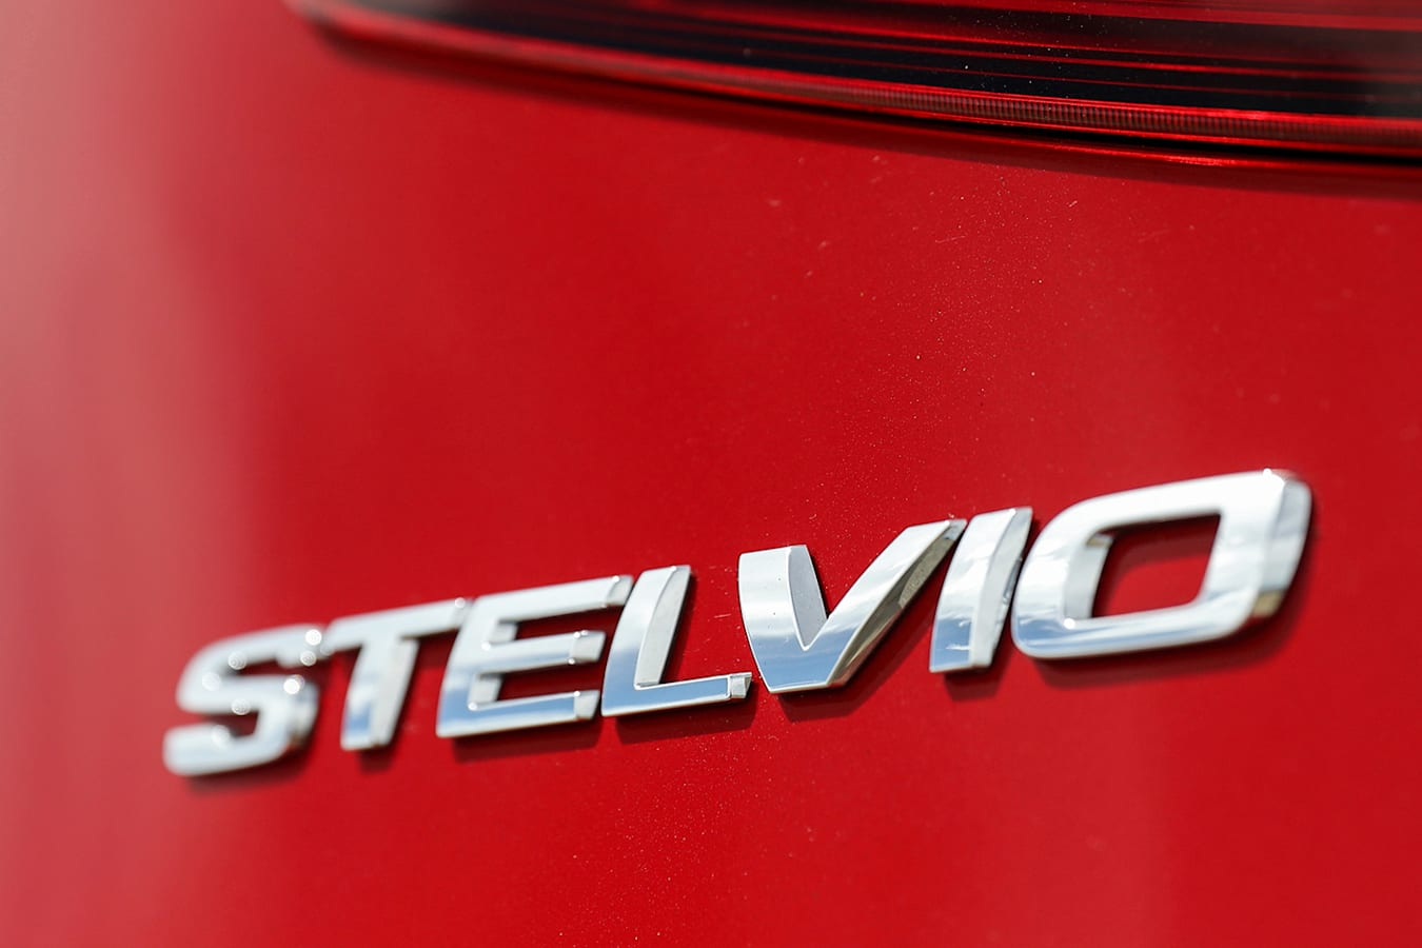 Alfa Stelvio Badge Jpg